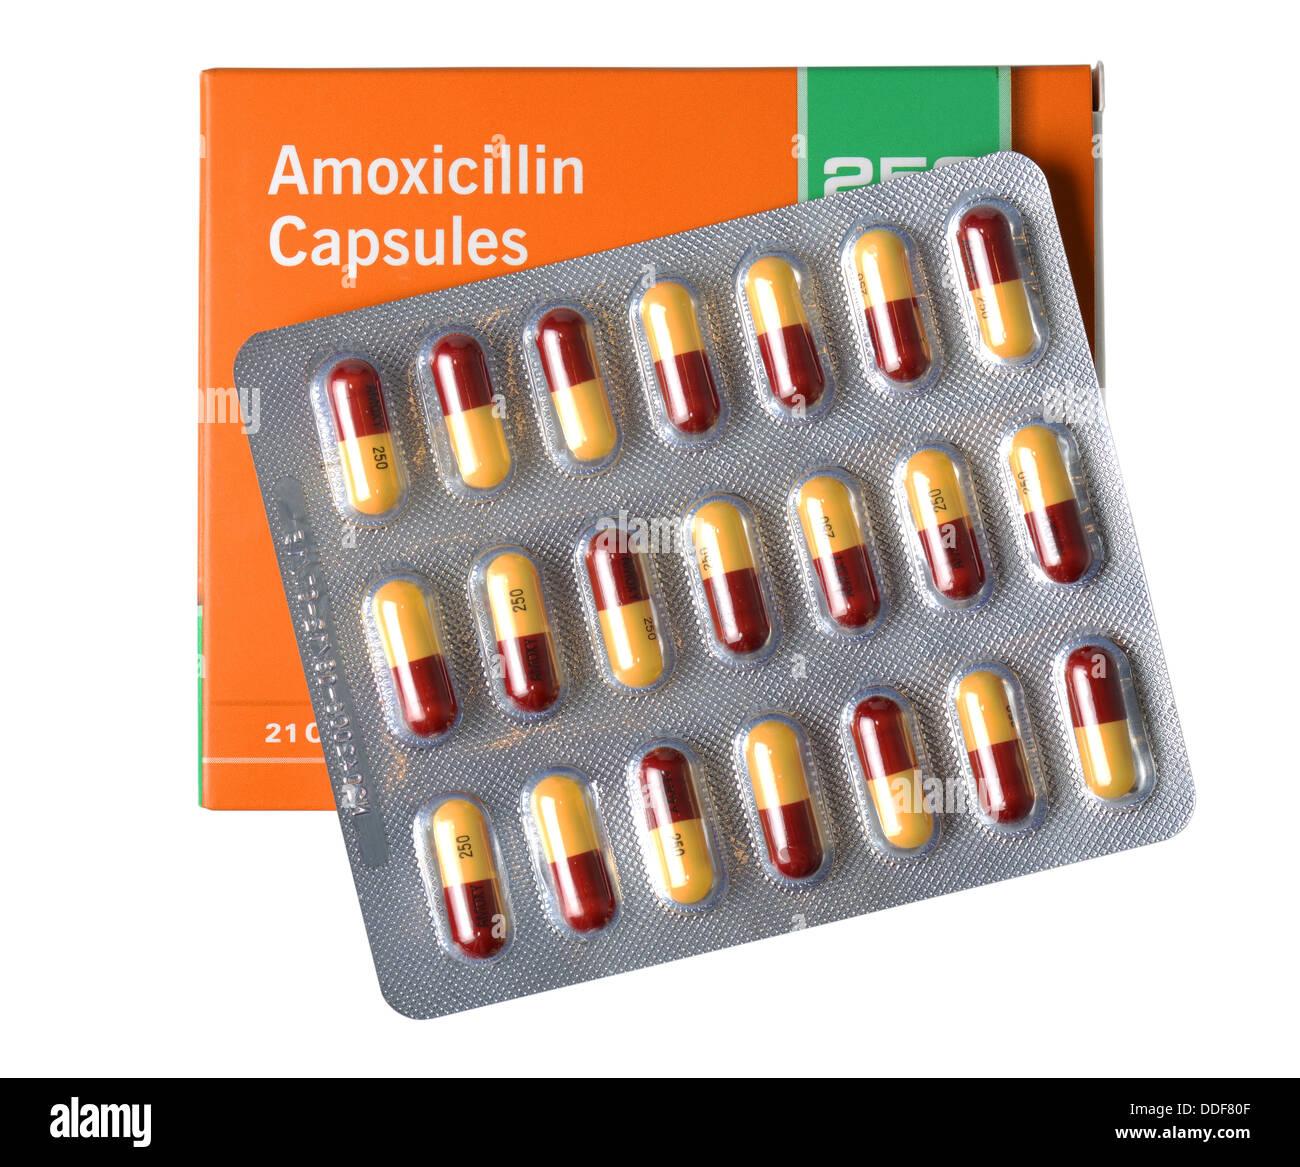 Penicillin antibiotic pill